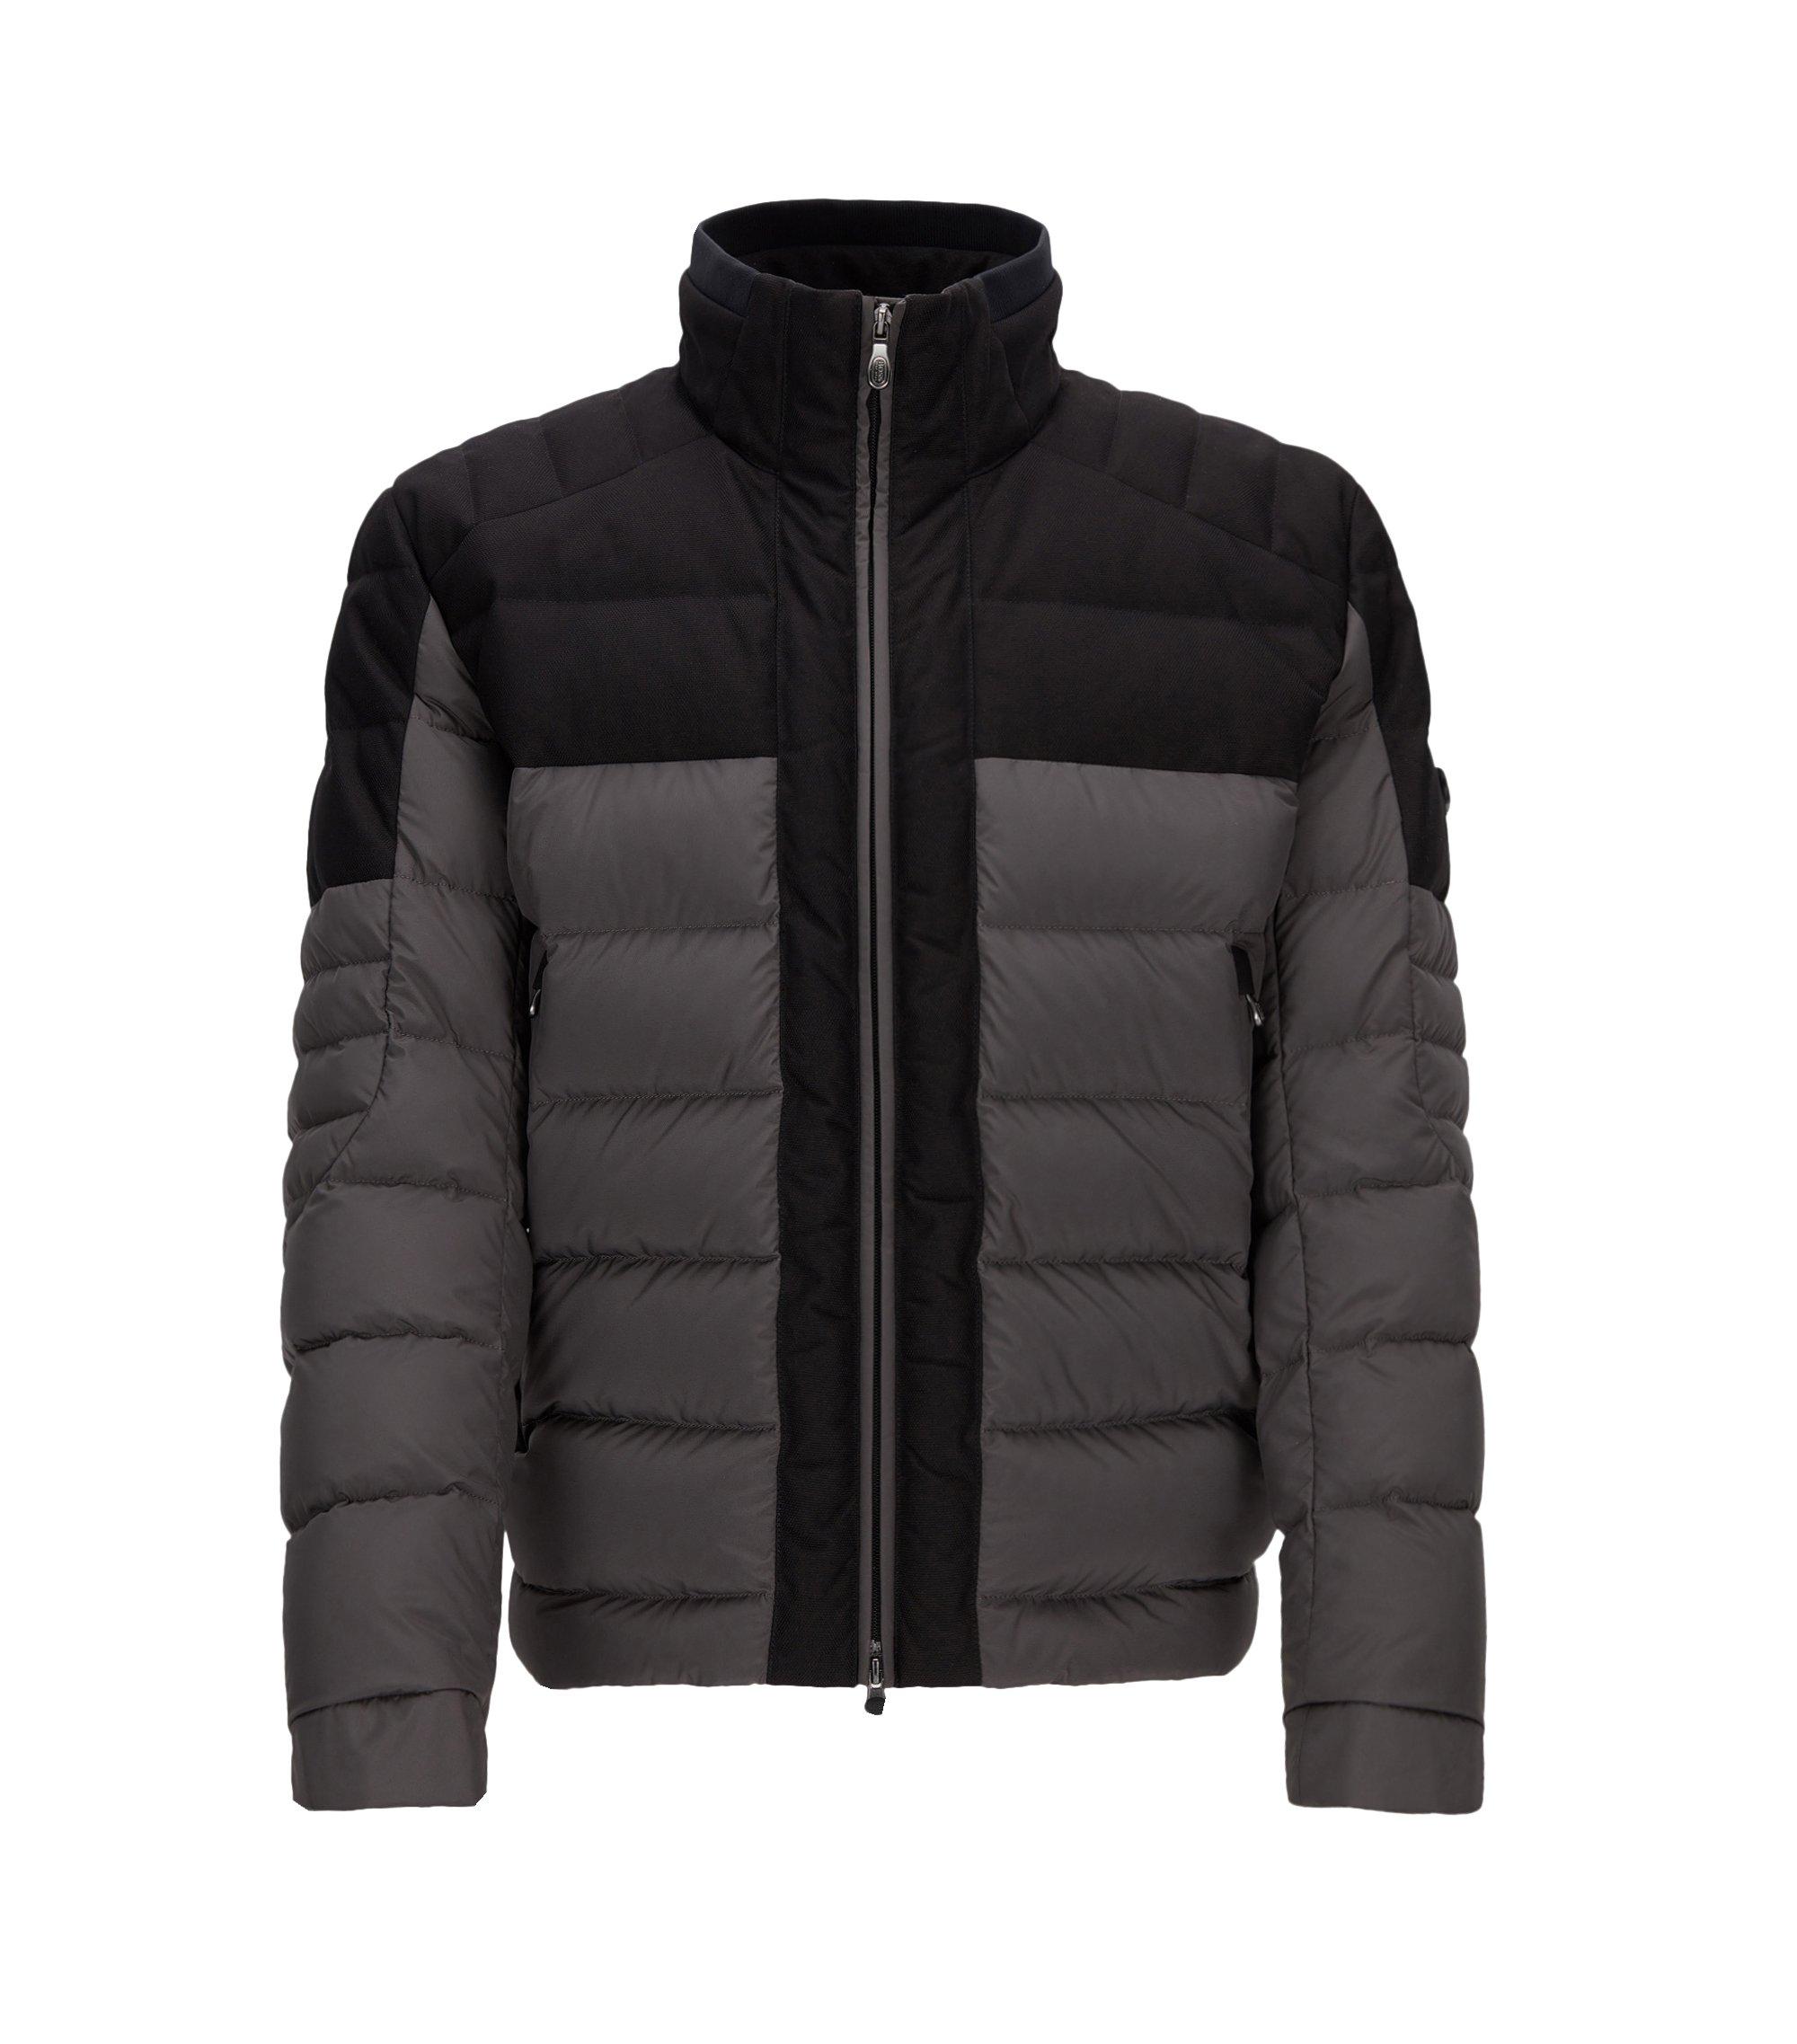 Nylon Quilted Jacket | Jonkins, Grey